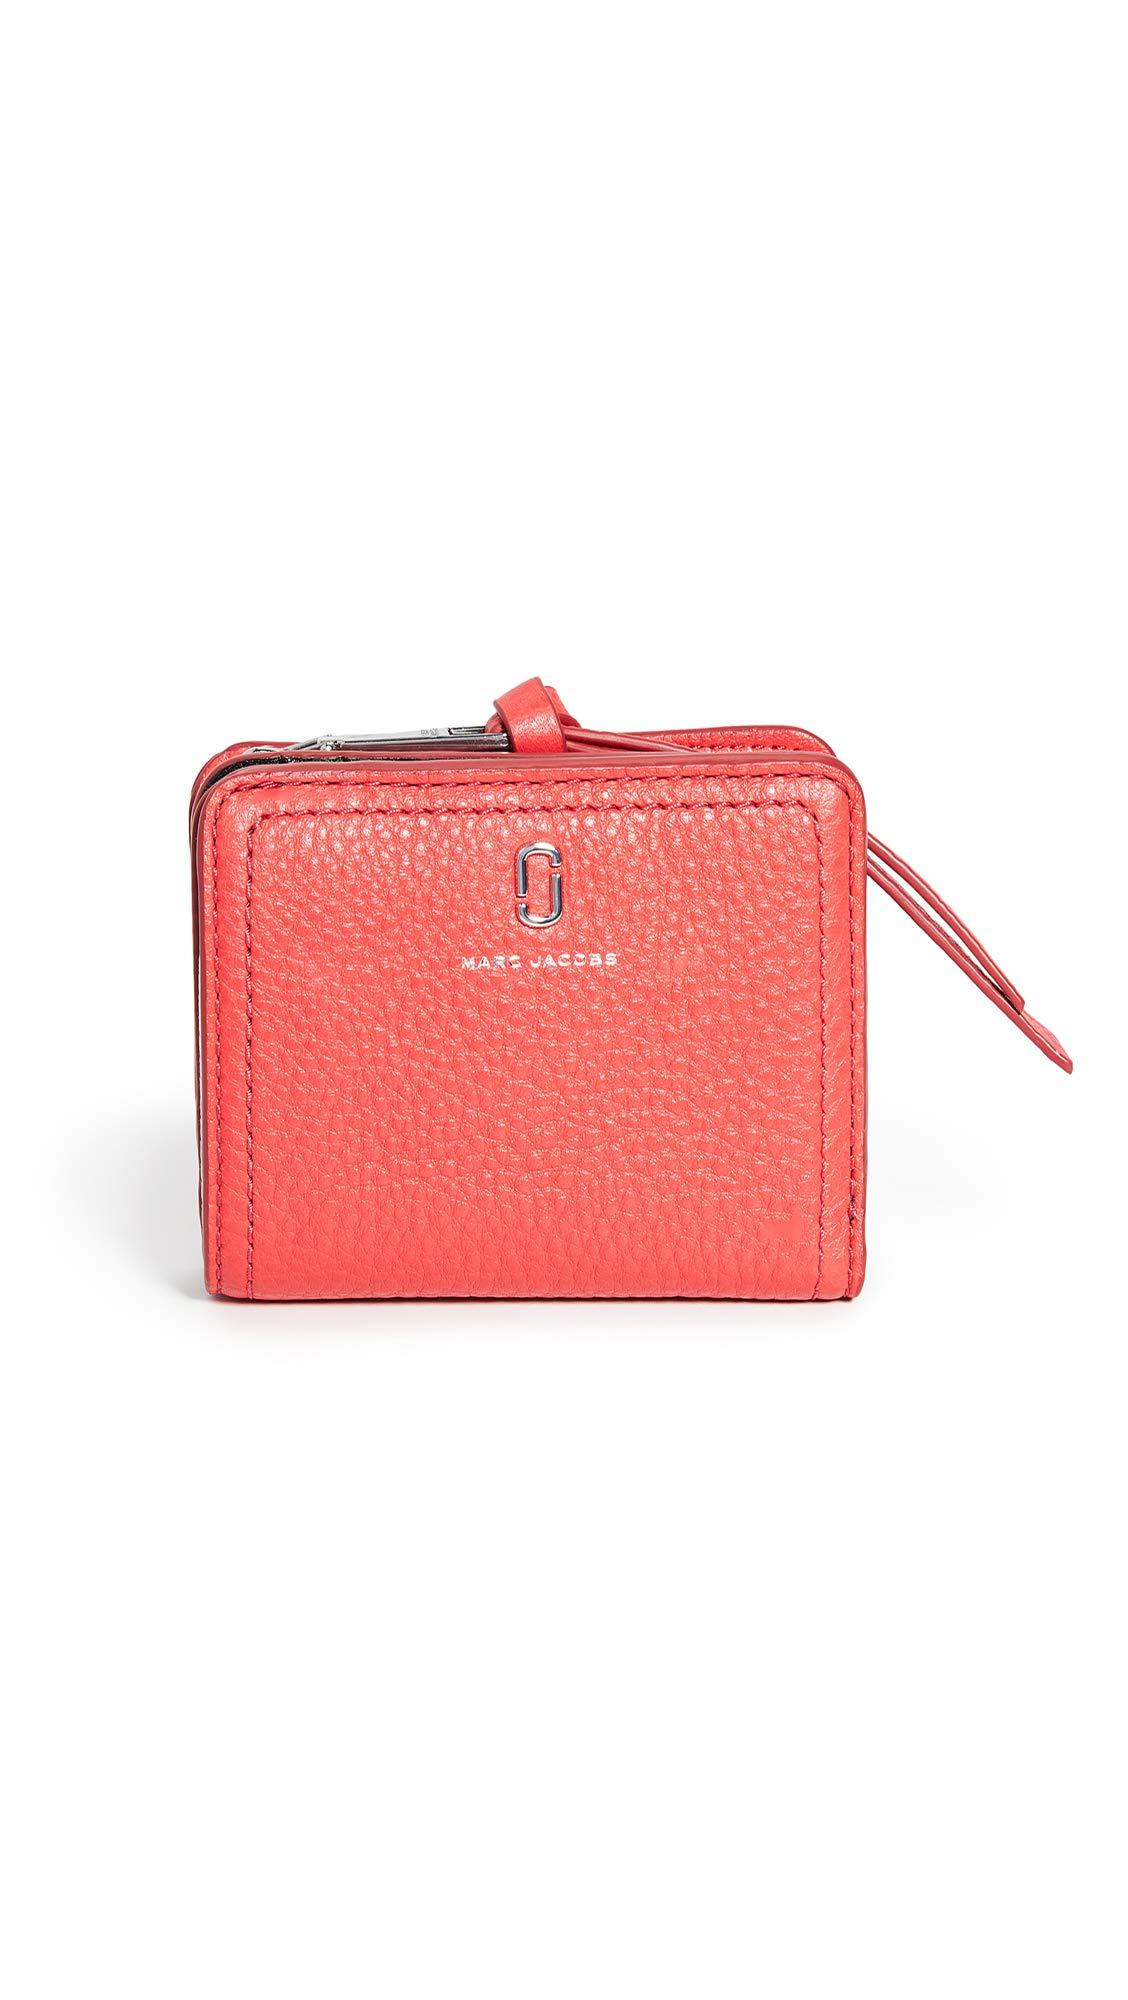 CDM product Marc Jacobs Women's Mini Compact Wallet big image